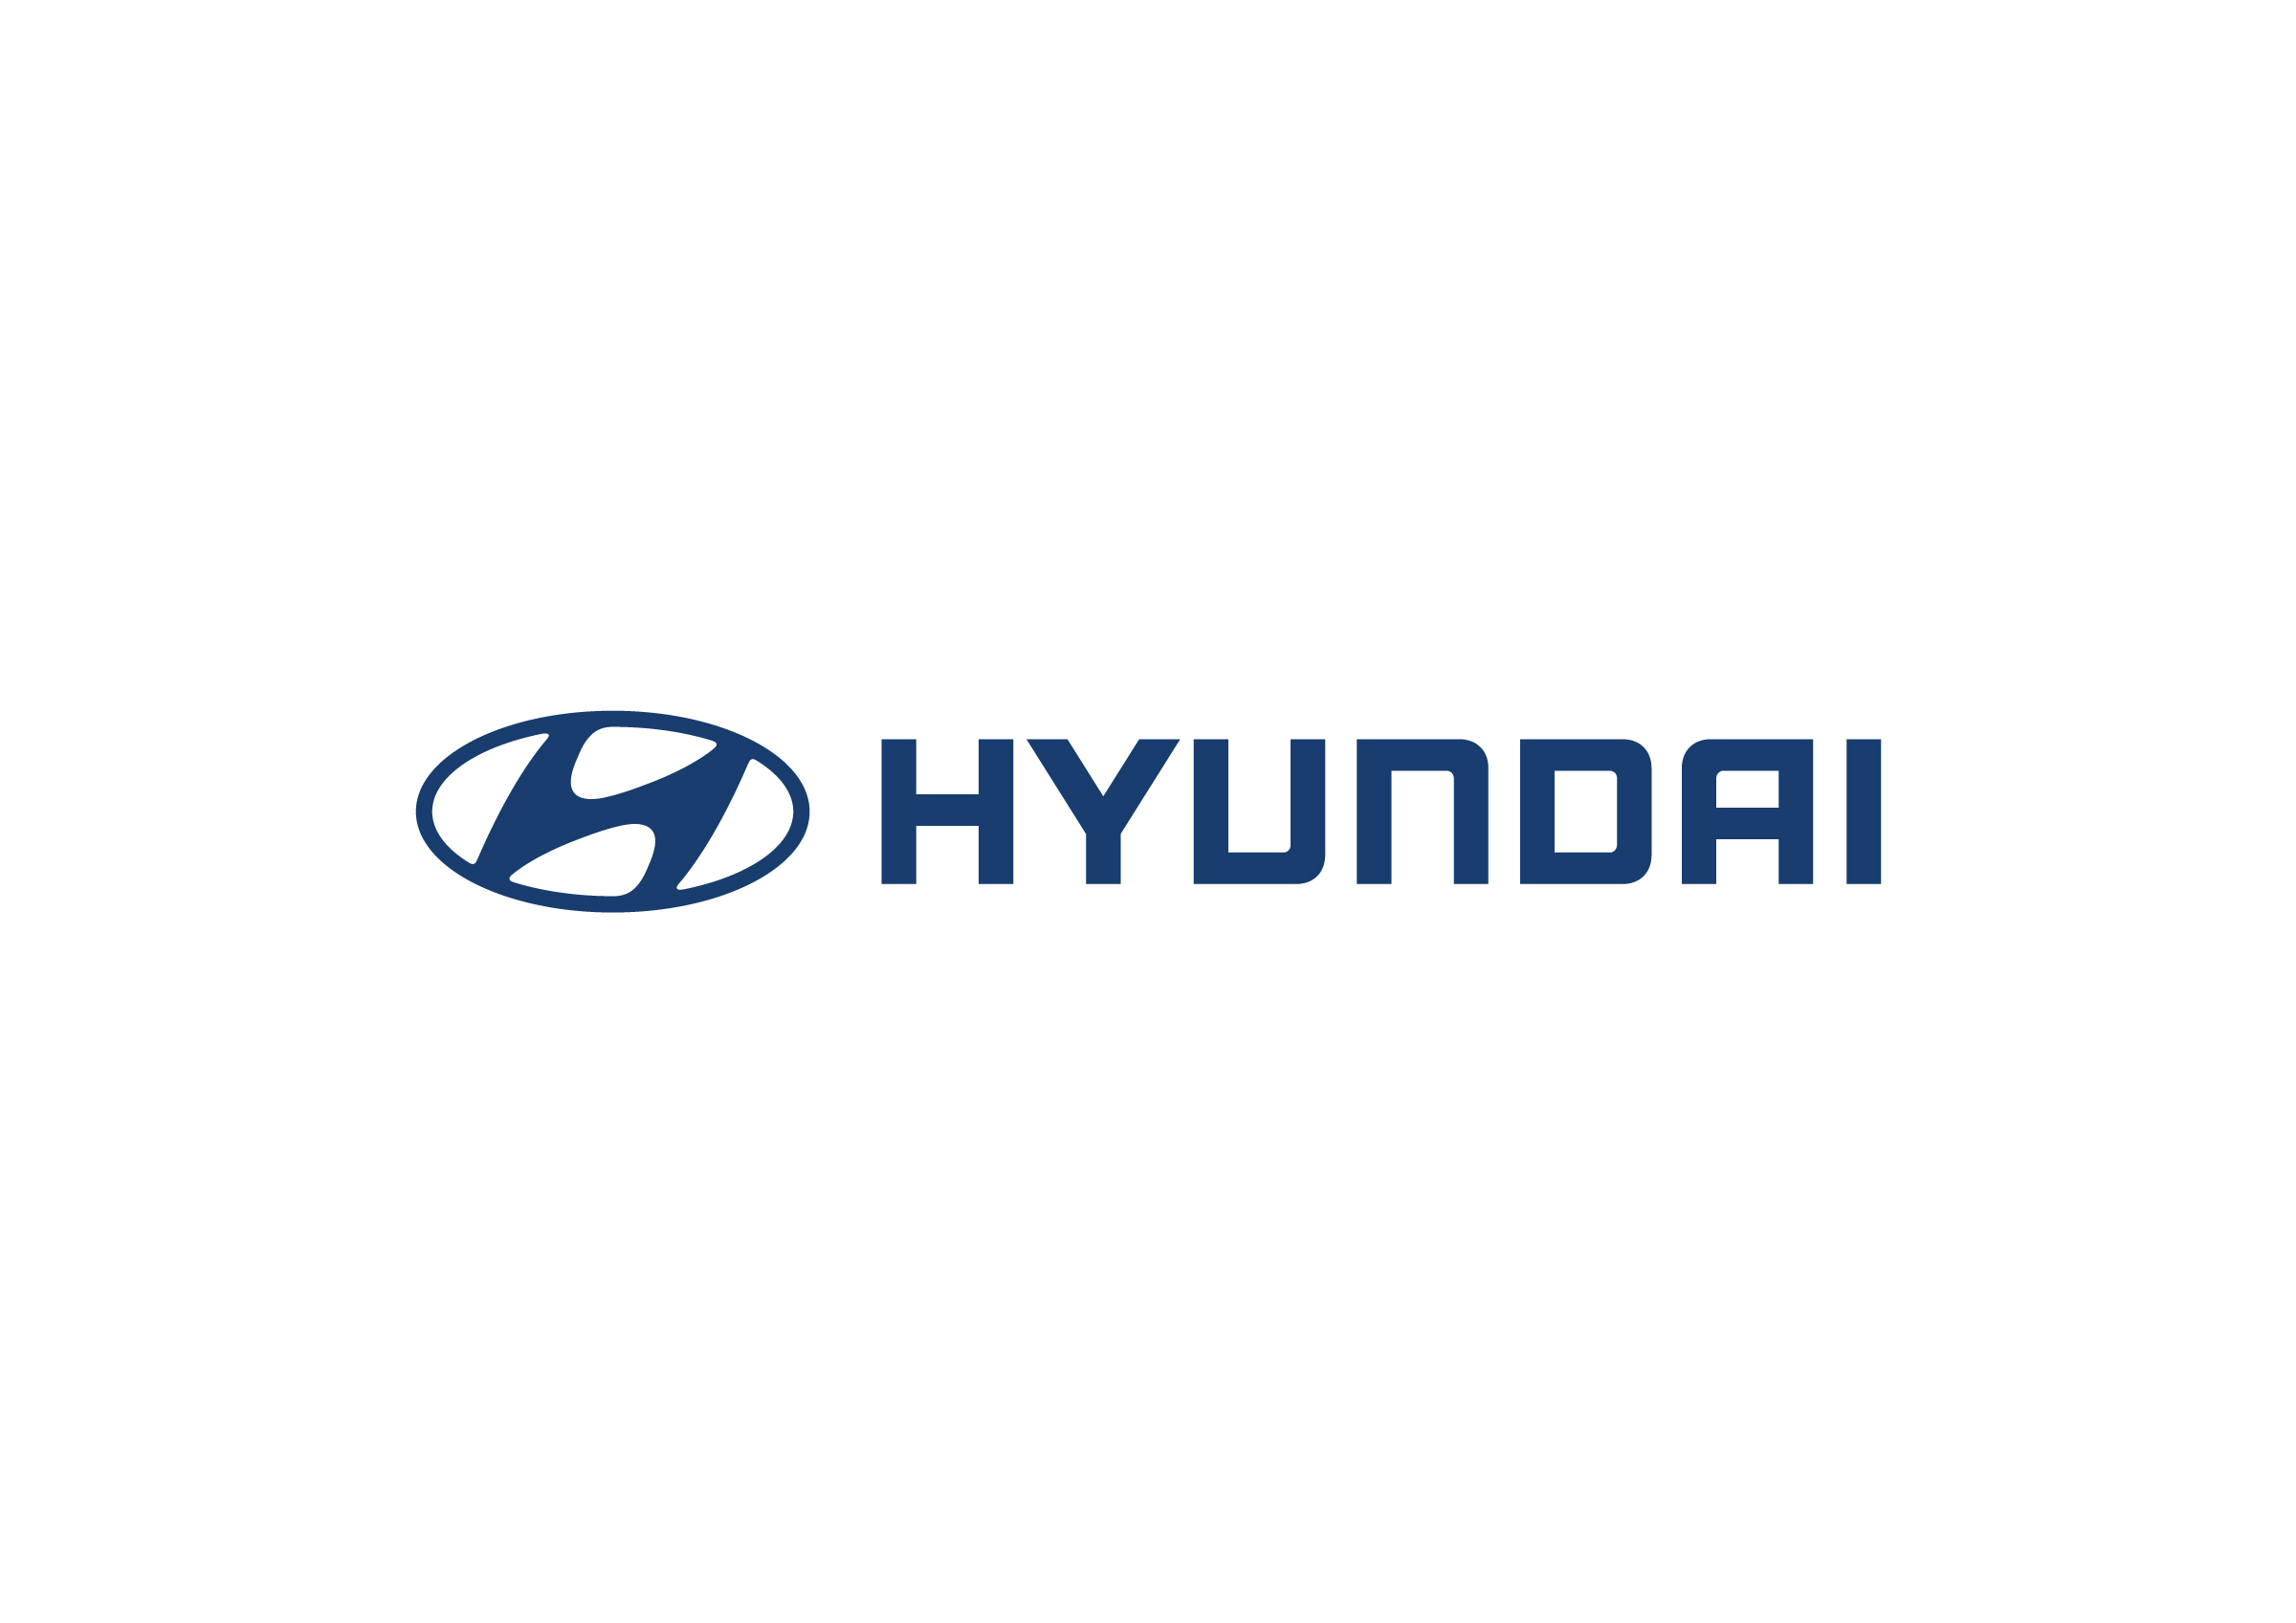 Design, progress and innovation: the future Hyundai is already here